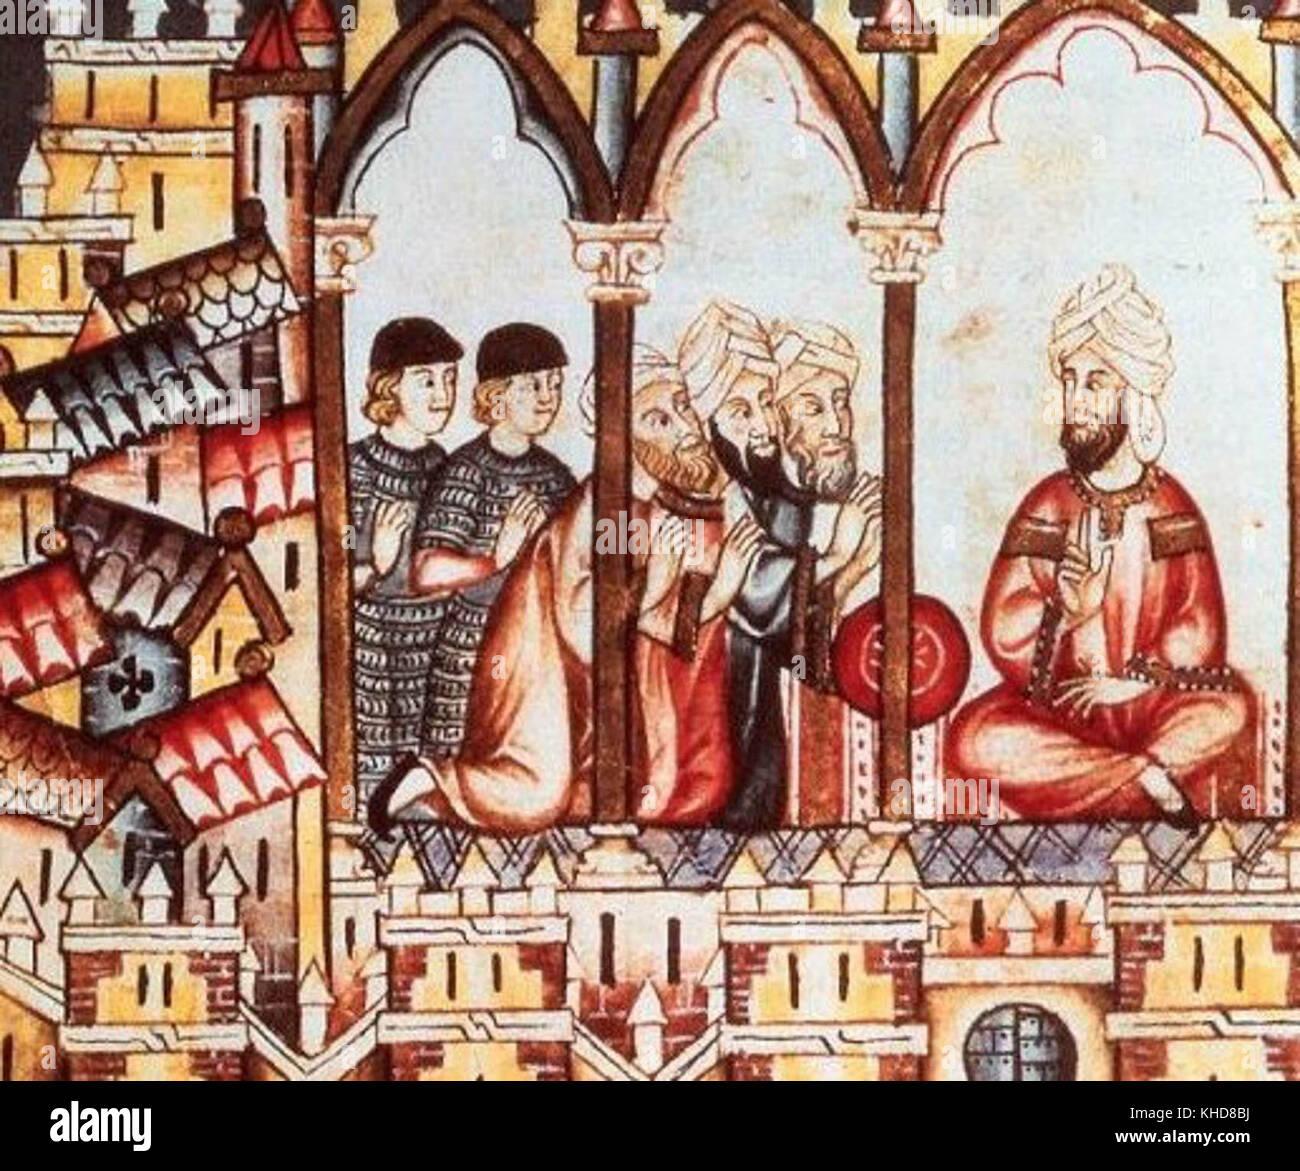 Castillian ambassadors attempting to convince Moorish Almohad king Abu Hafs Umar al-Murtada to join their alliance Stock Photo